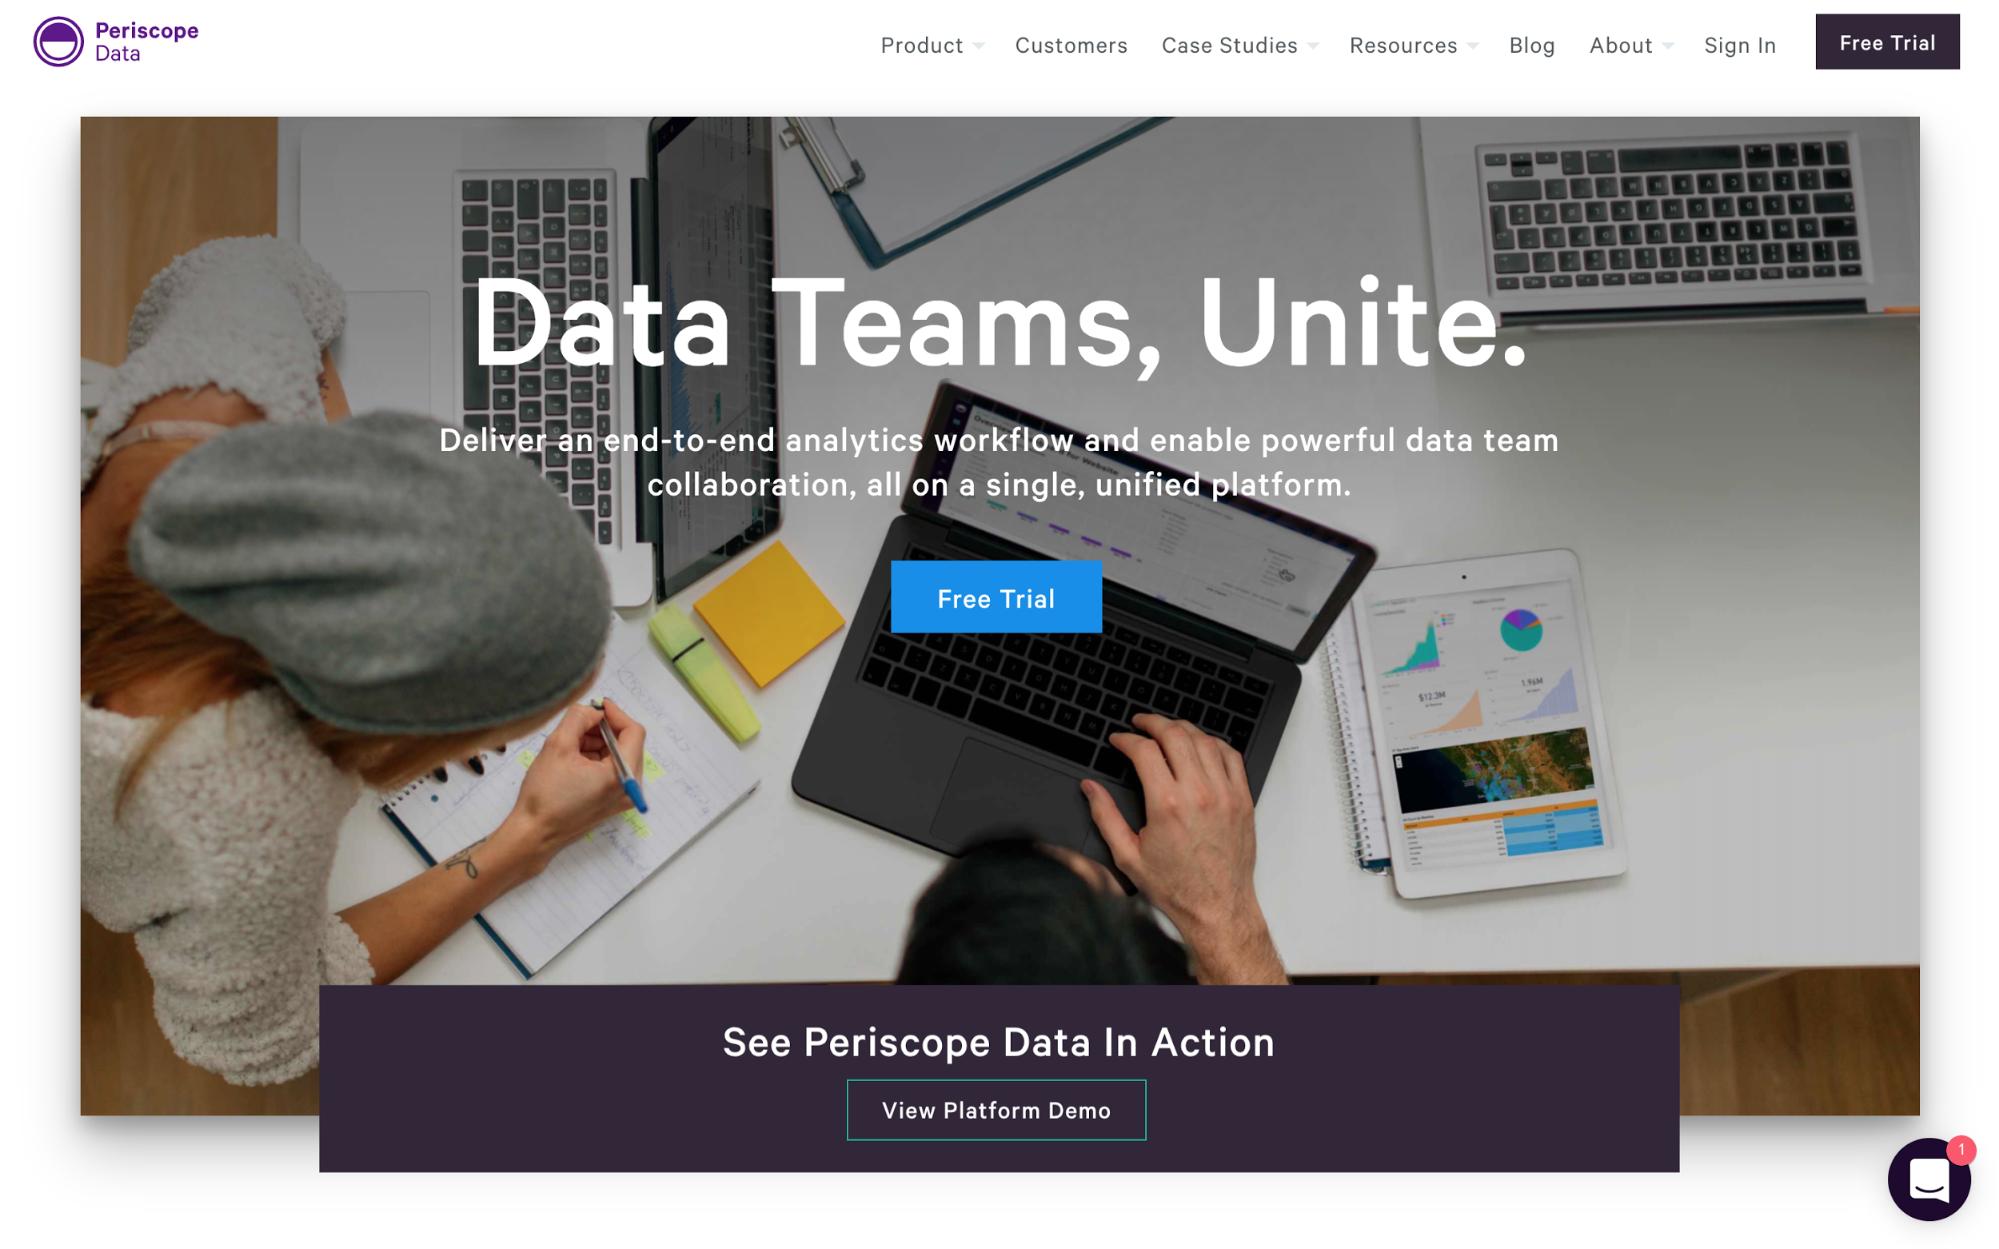 Periscope Data's homepage